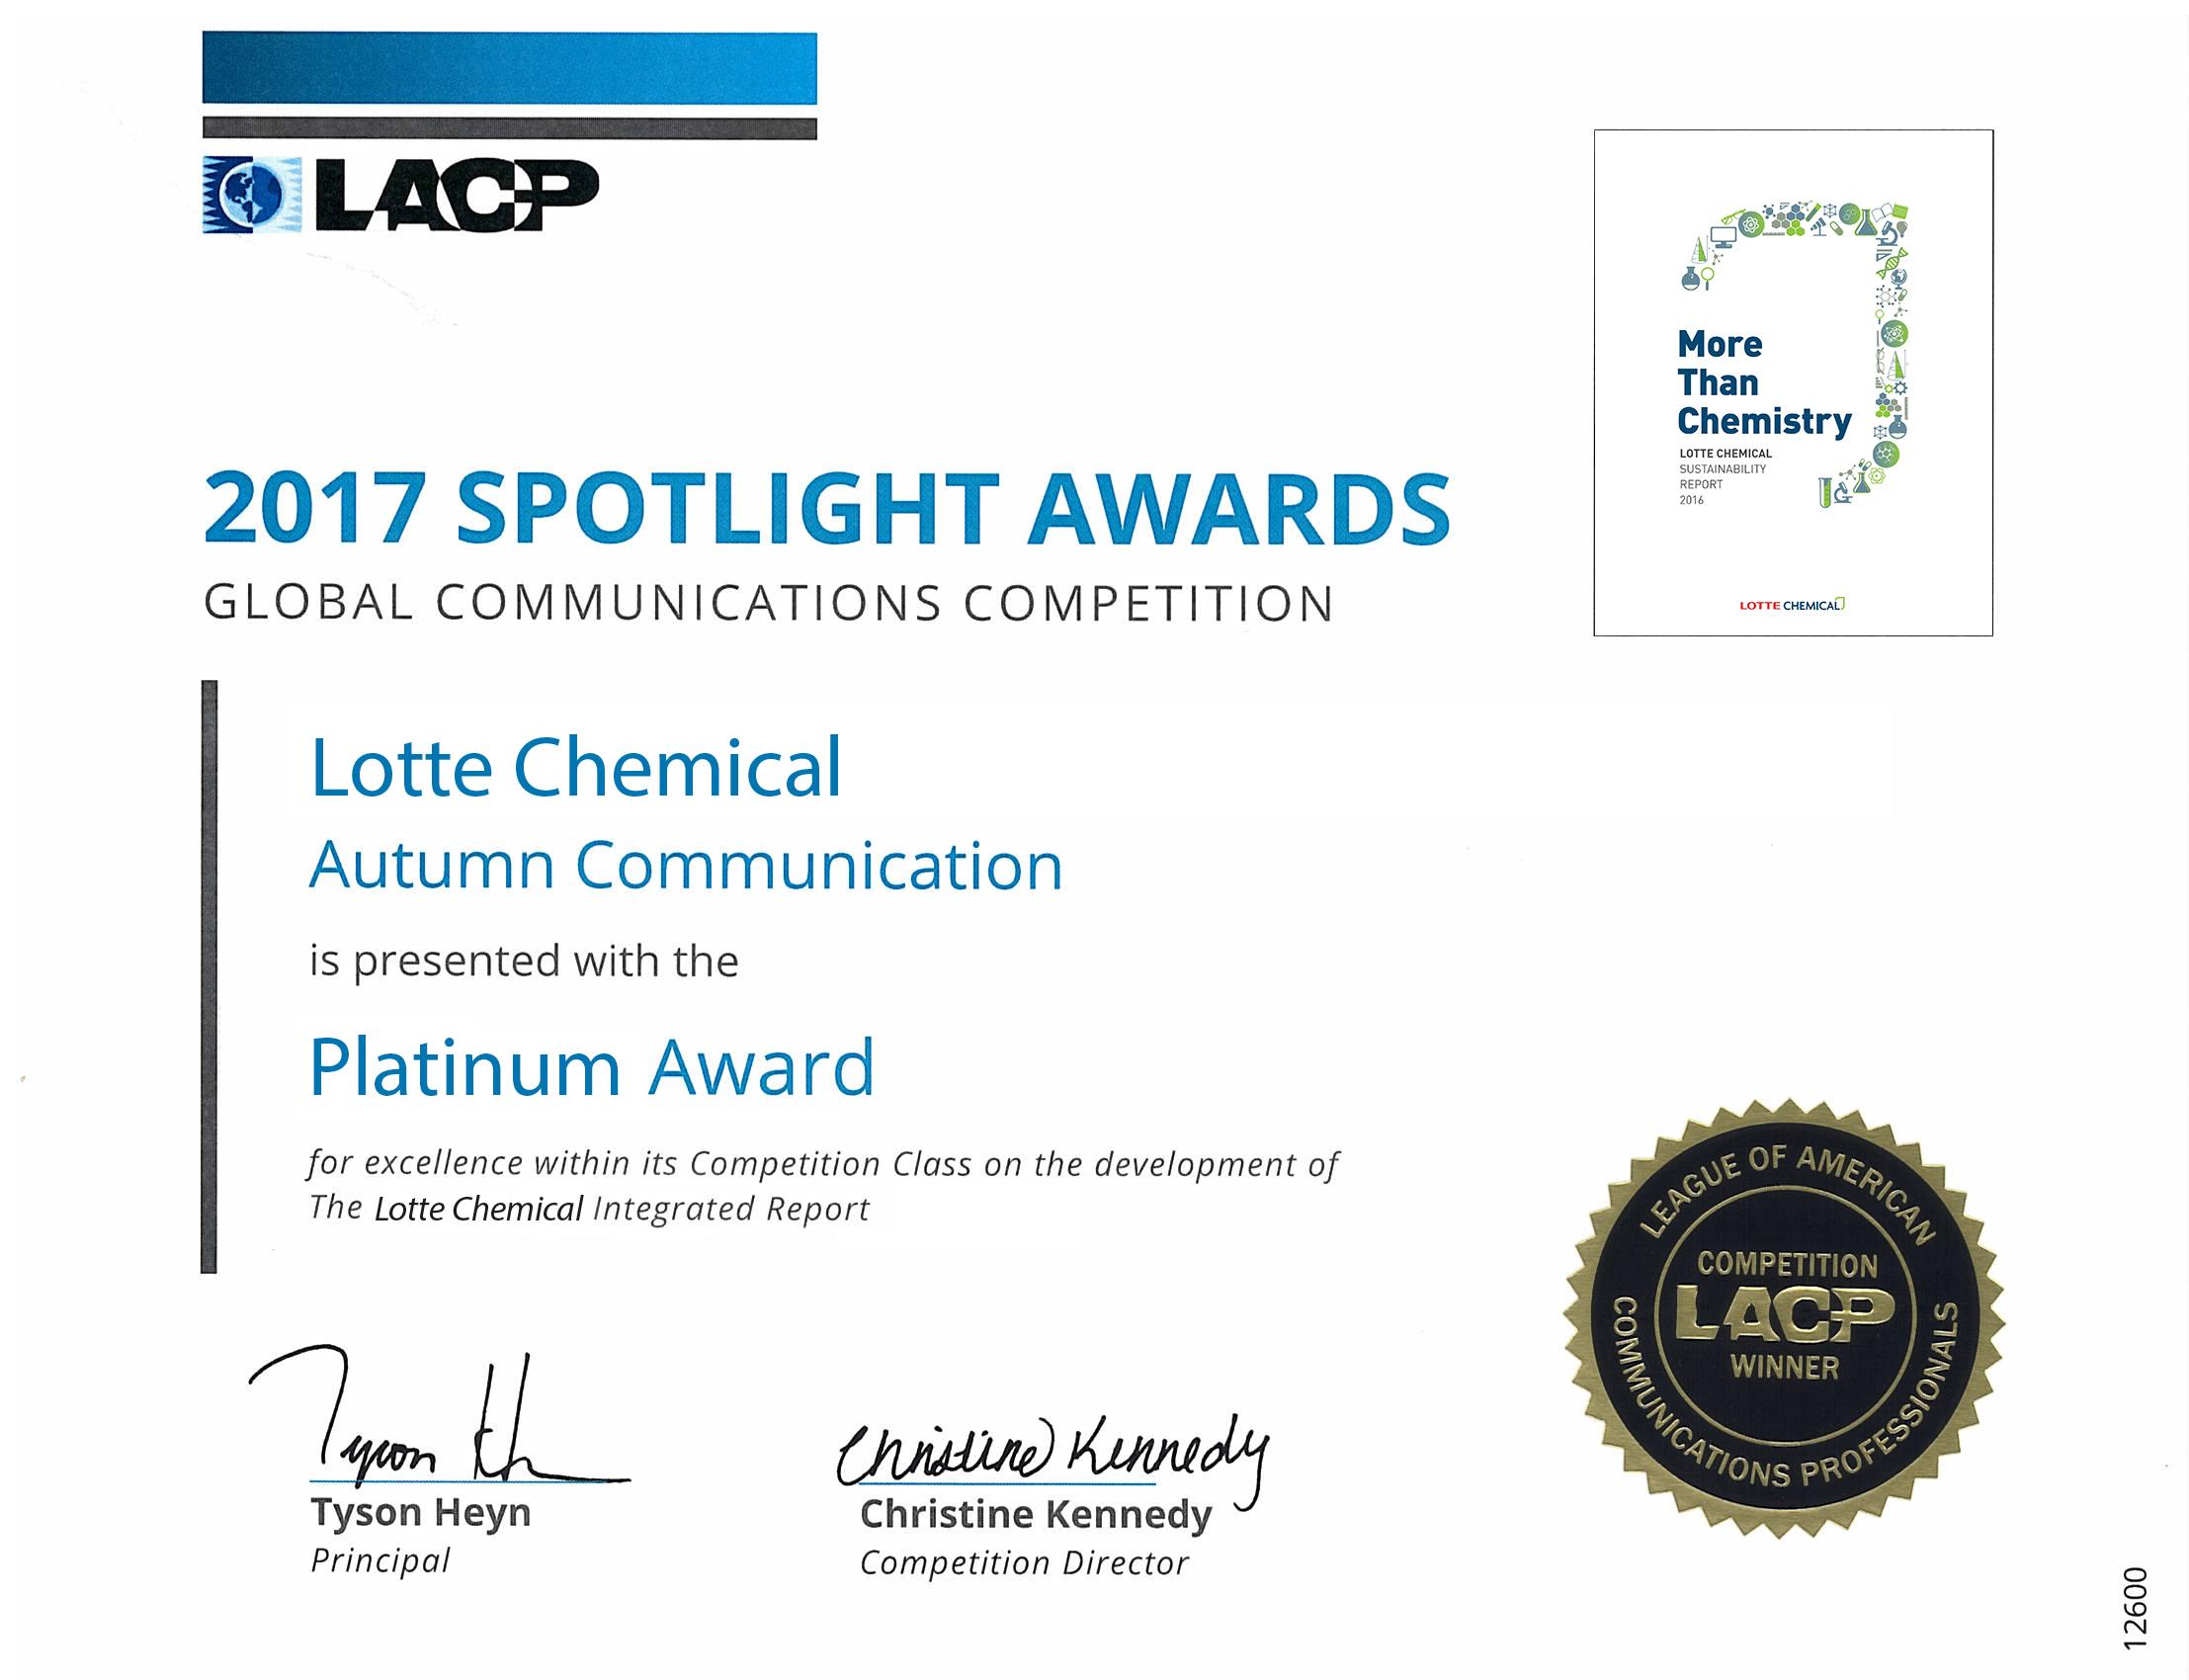 LACP Award_2017 Lotte Chemical (Platinum Award).jpg